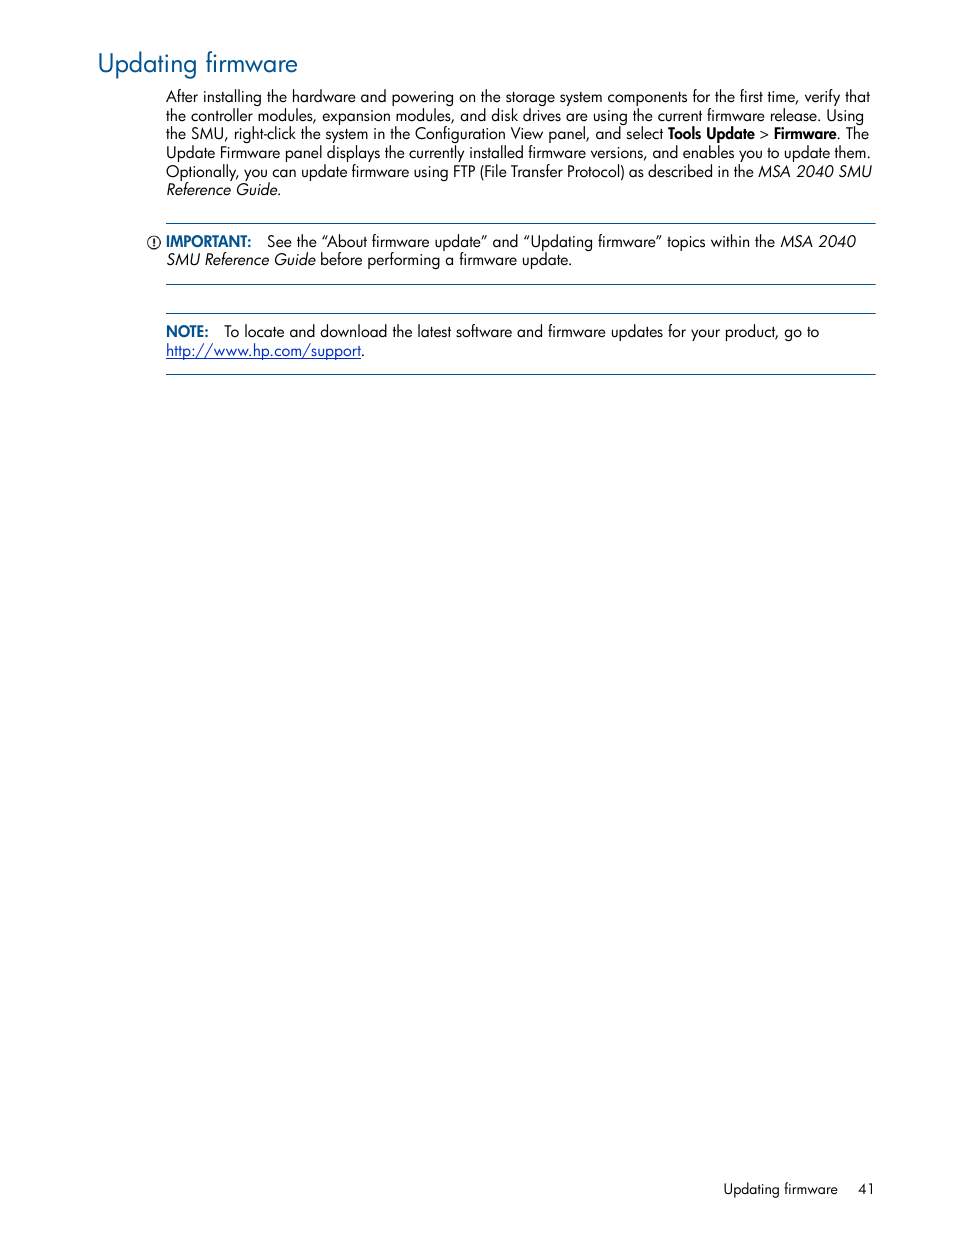 Updating firmware | HP MSA 2040 SAN Storage User Manual